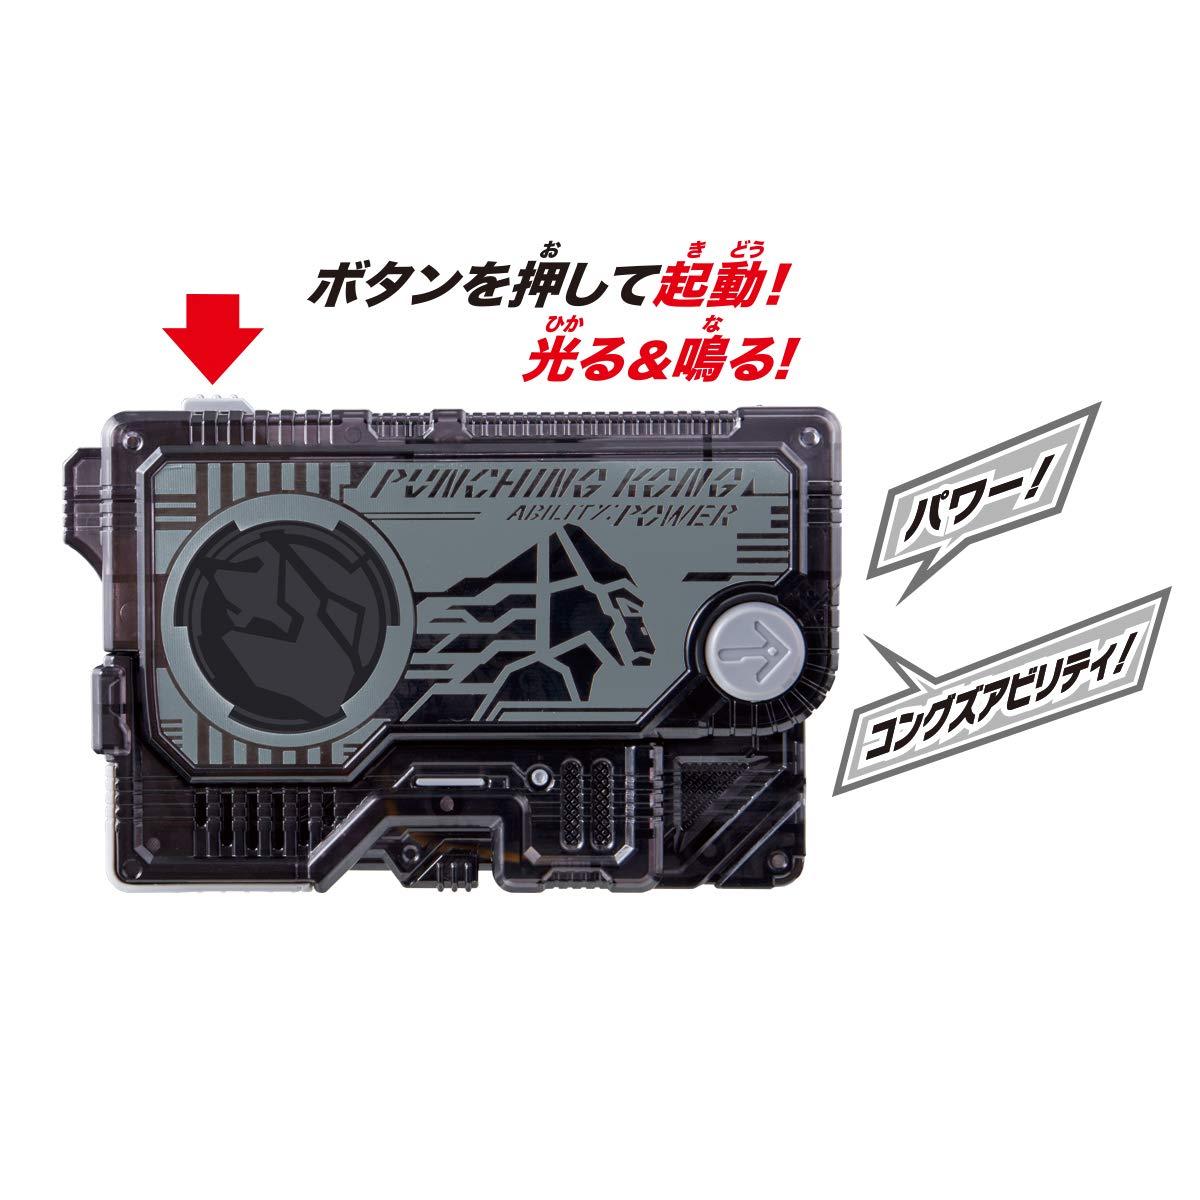 BANDAI 假面騎士ZERO-ONE DX Punching Kong 拳擊金剛 程式昇華之鑰【預購】【星野日本玩具】